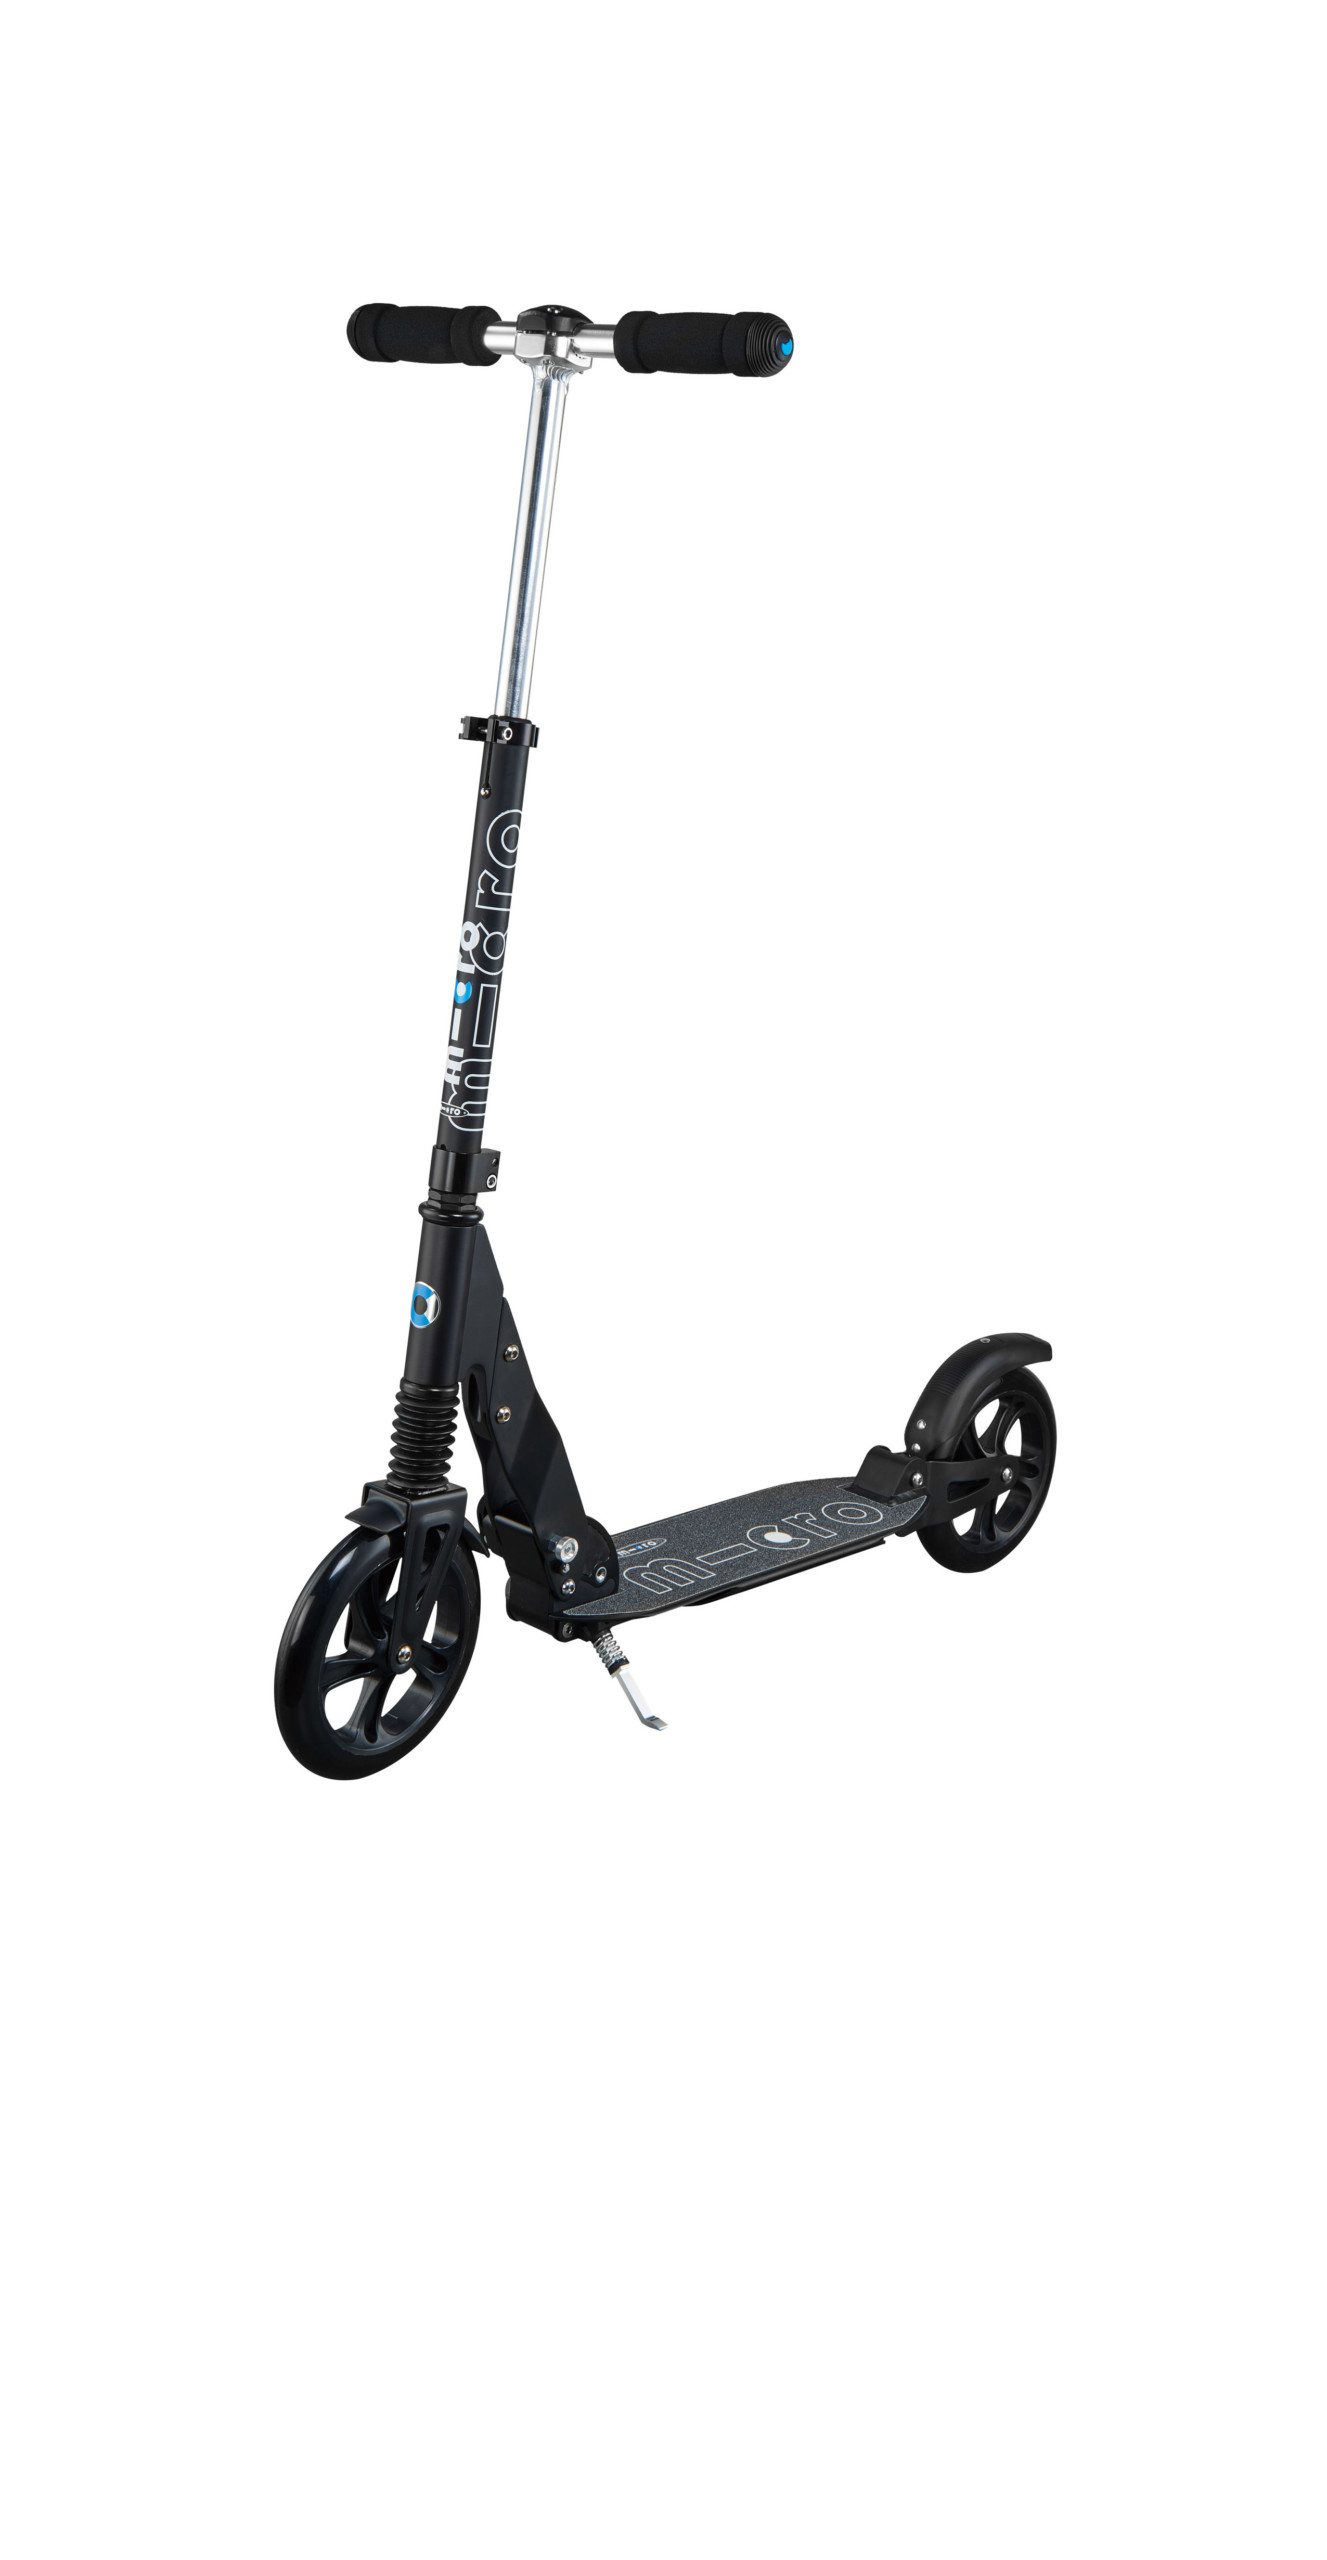 micro scooter suspension (Erw.)